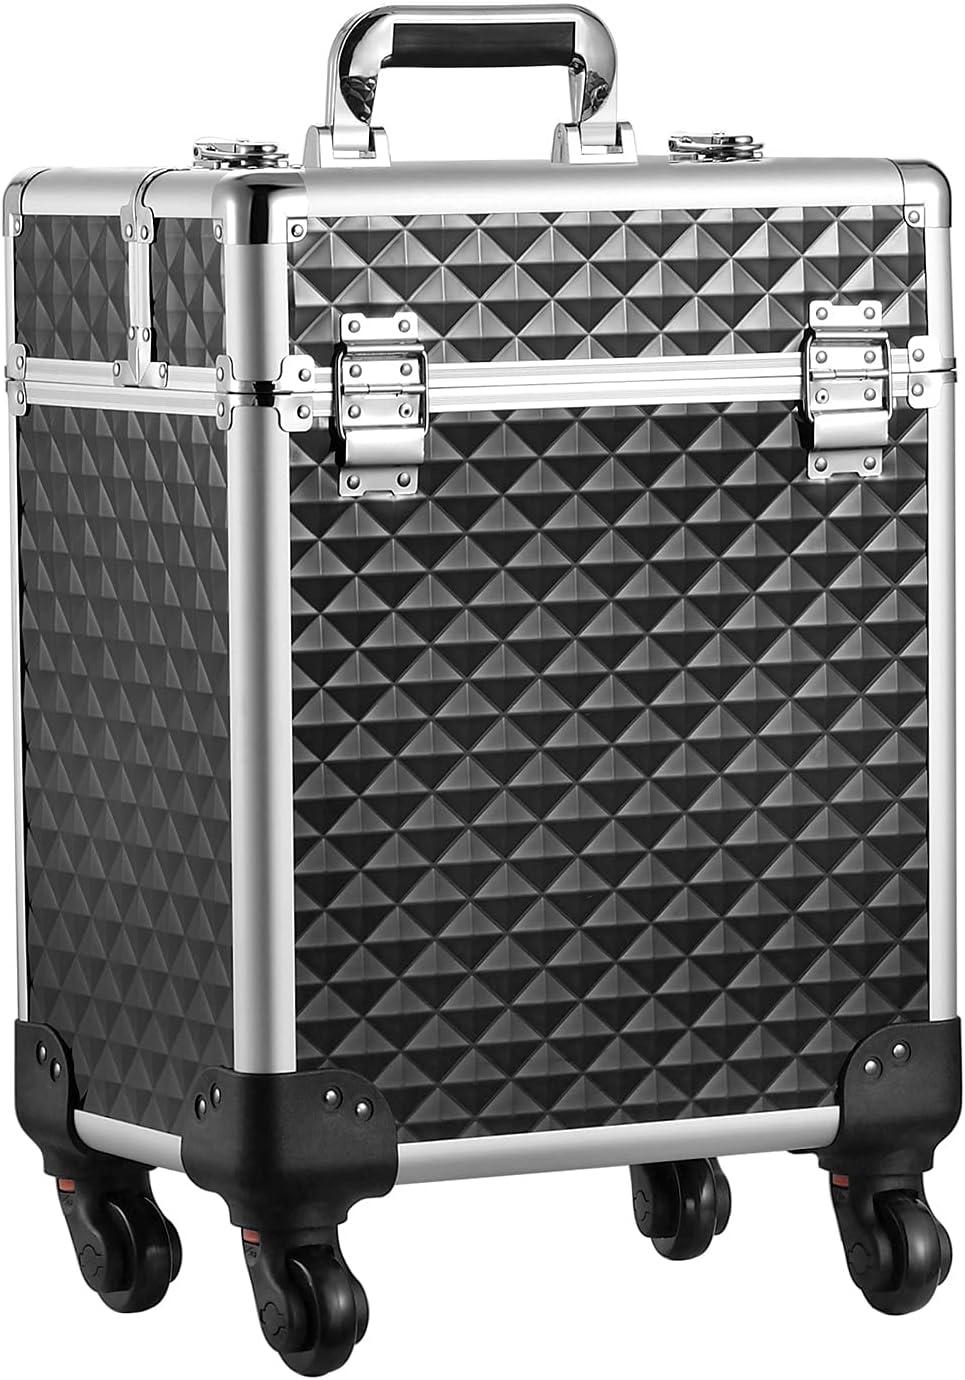 Mecucasi Rolling Makeup Train Case Aluminum Large Ranking TOP6 Alum Organized New Free Shipping